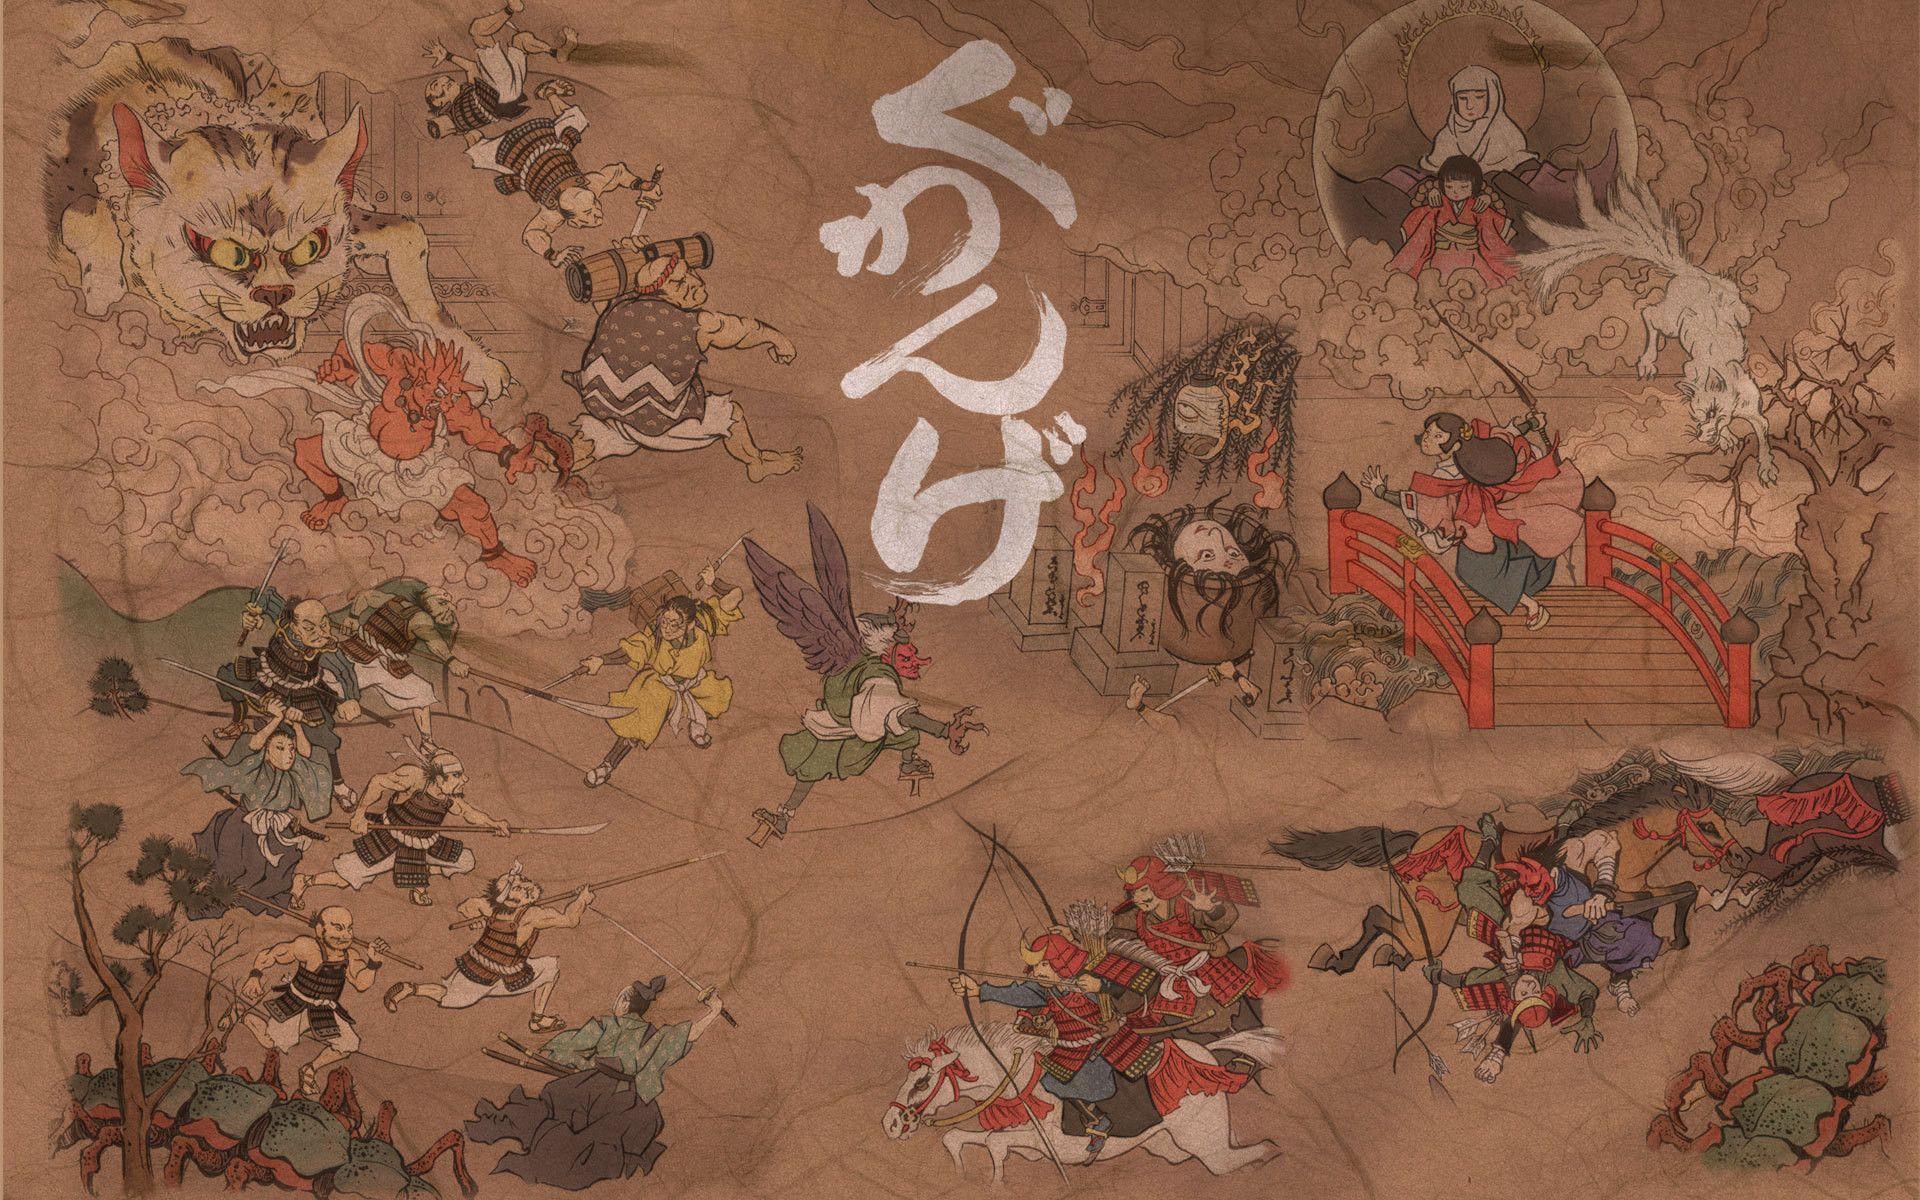 1920x1200 Japanese Art Desktop Wallpaper Japanese Art Art Wallpaper Iphone Japanese Artwork